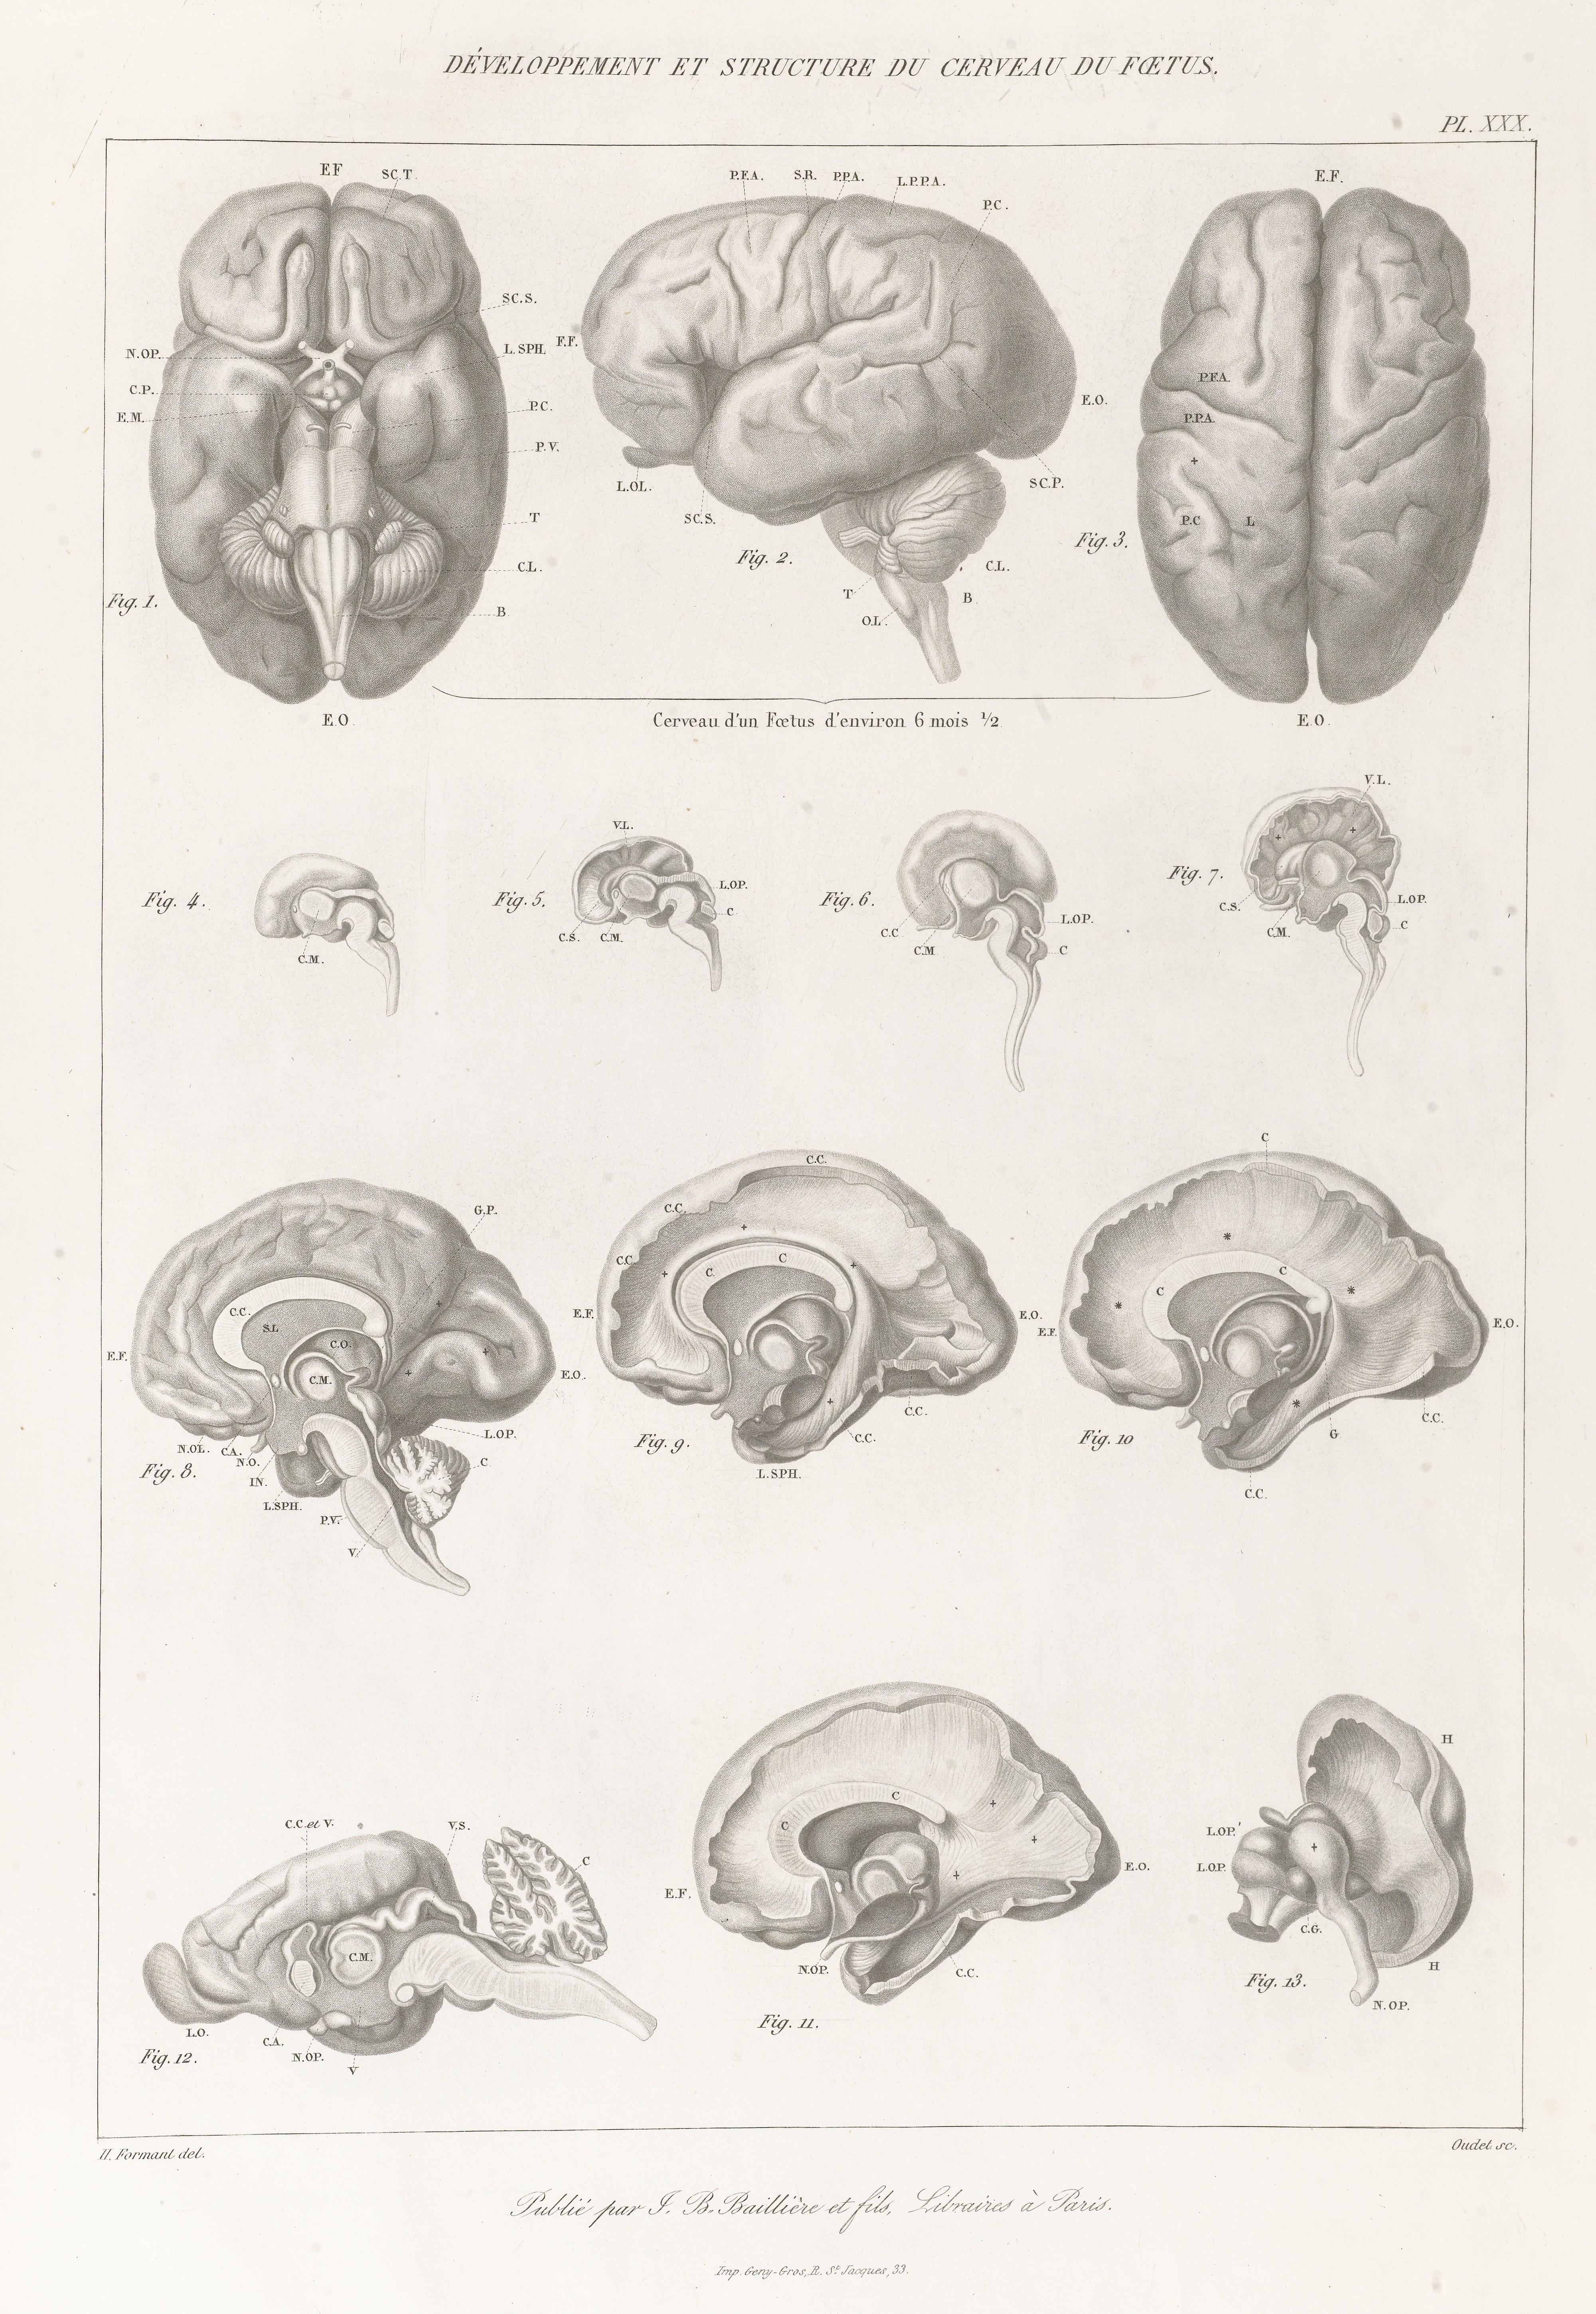 File:Anatomie comparée du système nerveux Wellcome L0068458.jpg ...